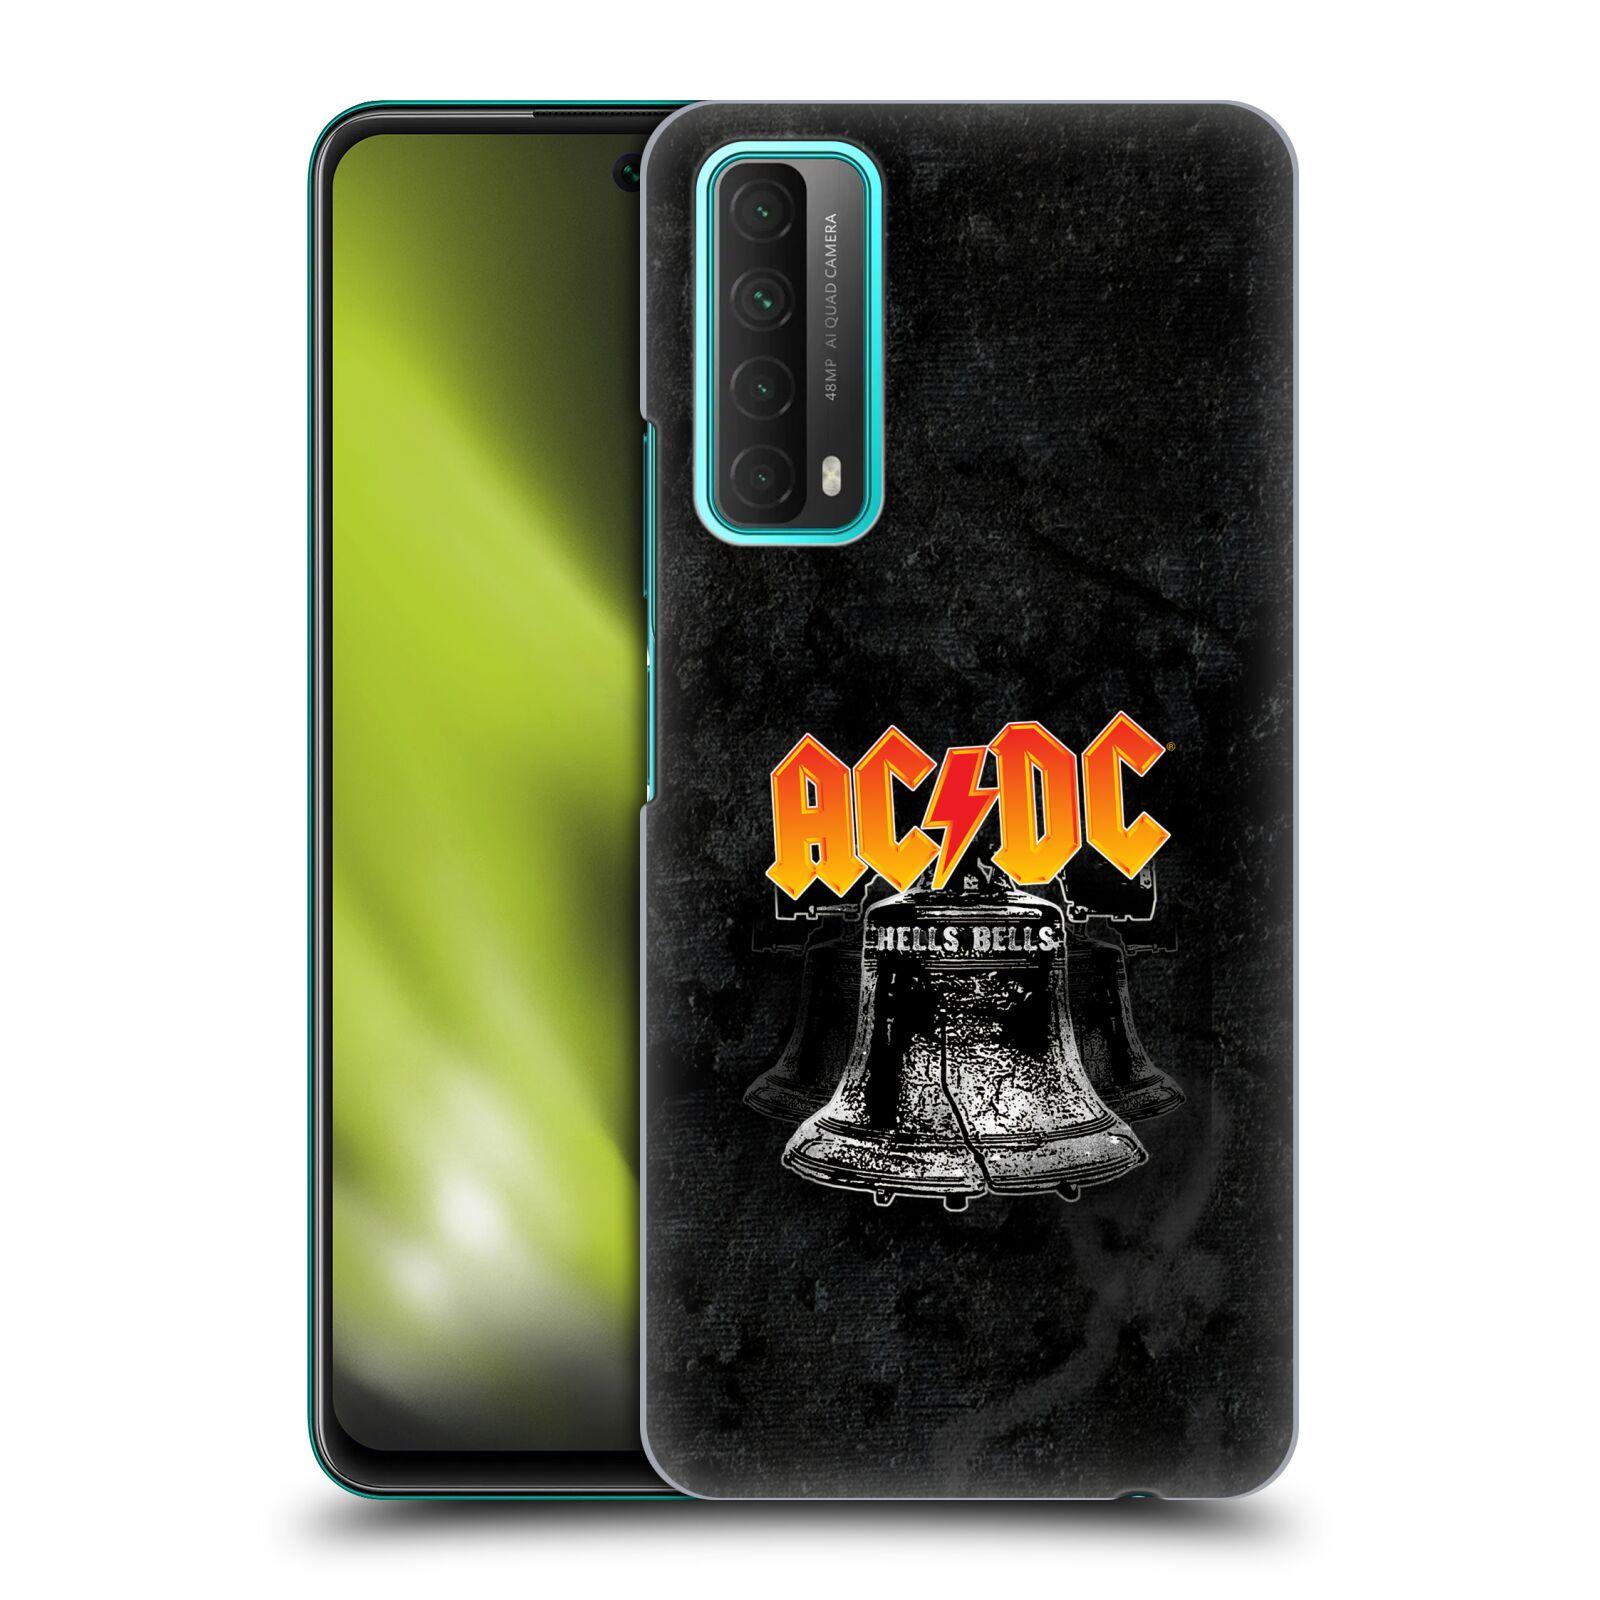 Plastové pouzdro na mobil Huawei P Smart (2021) - Head Case - AC/DC Hells Bells